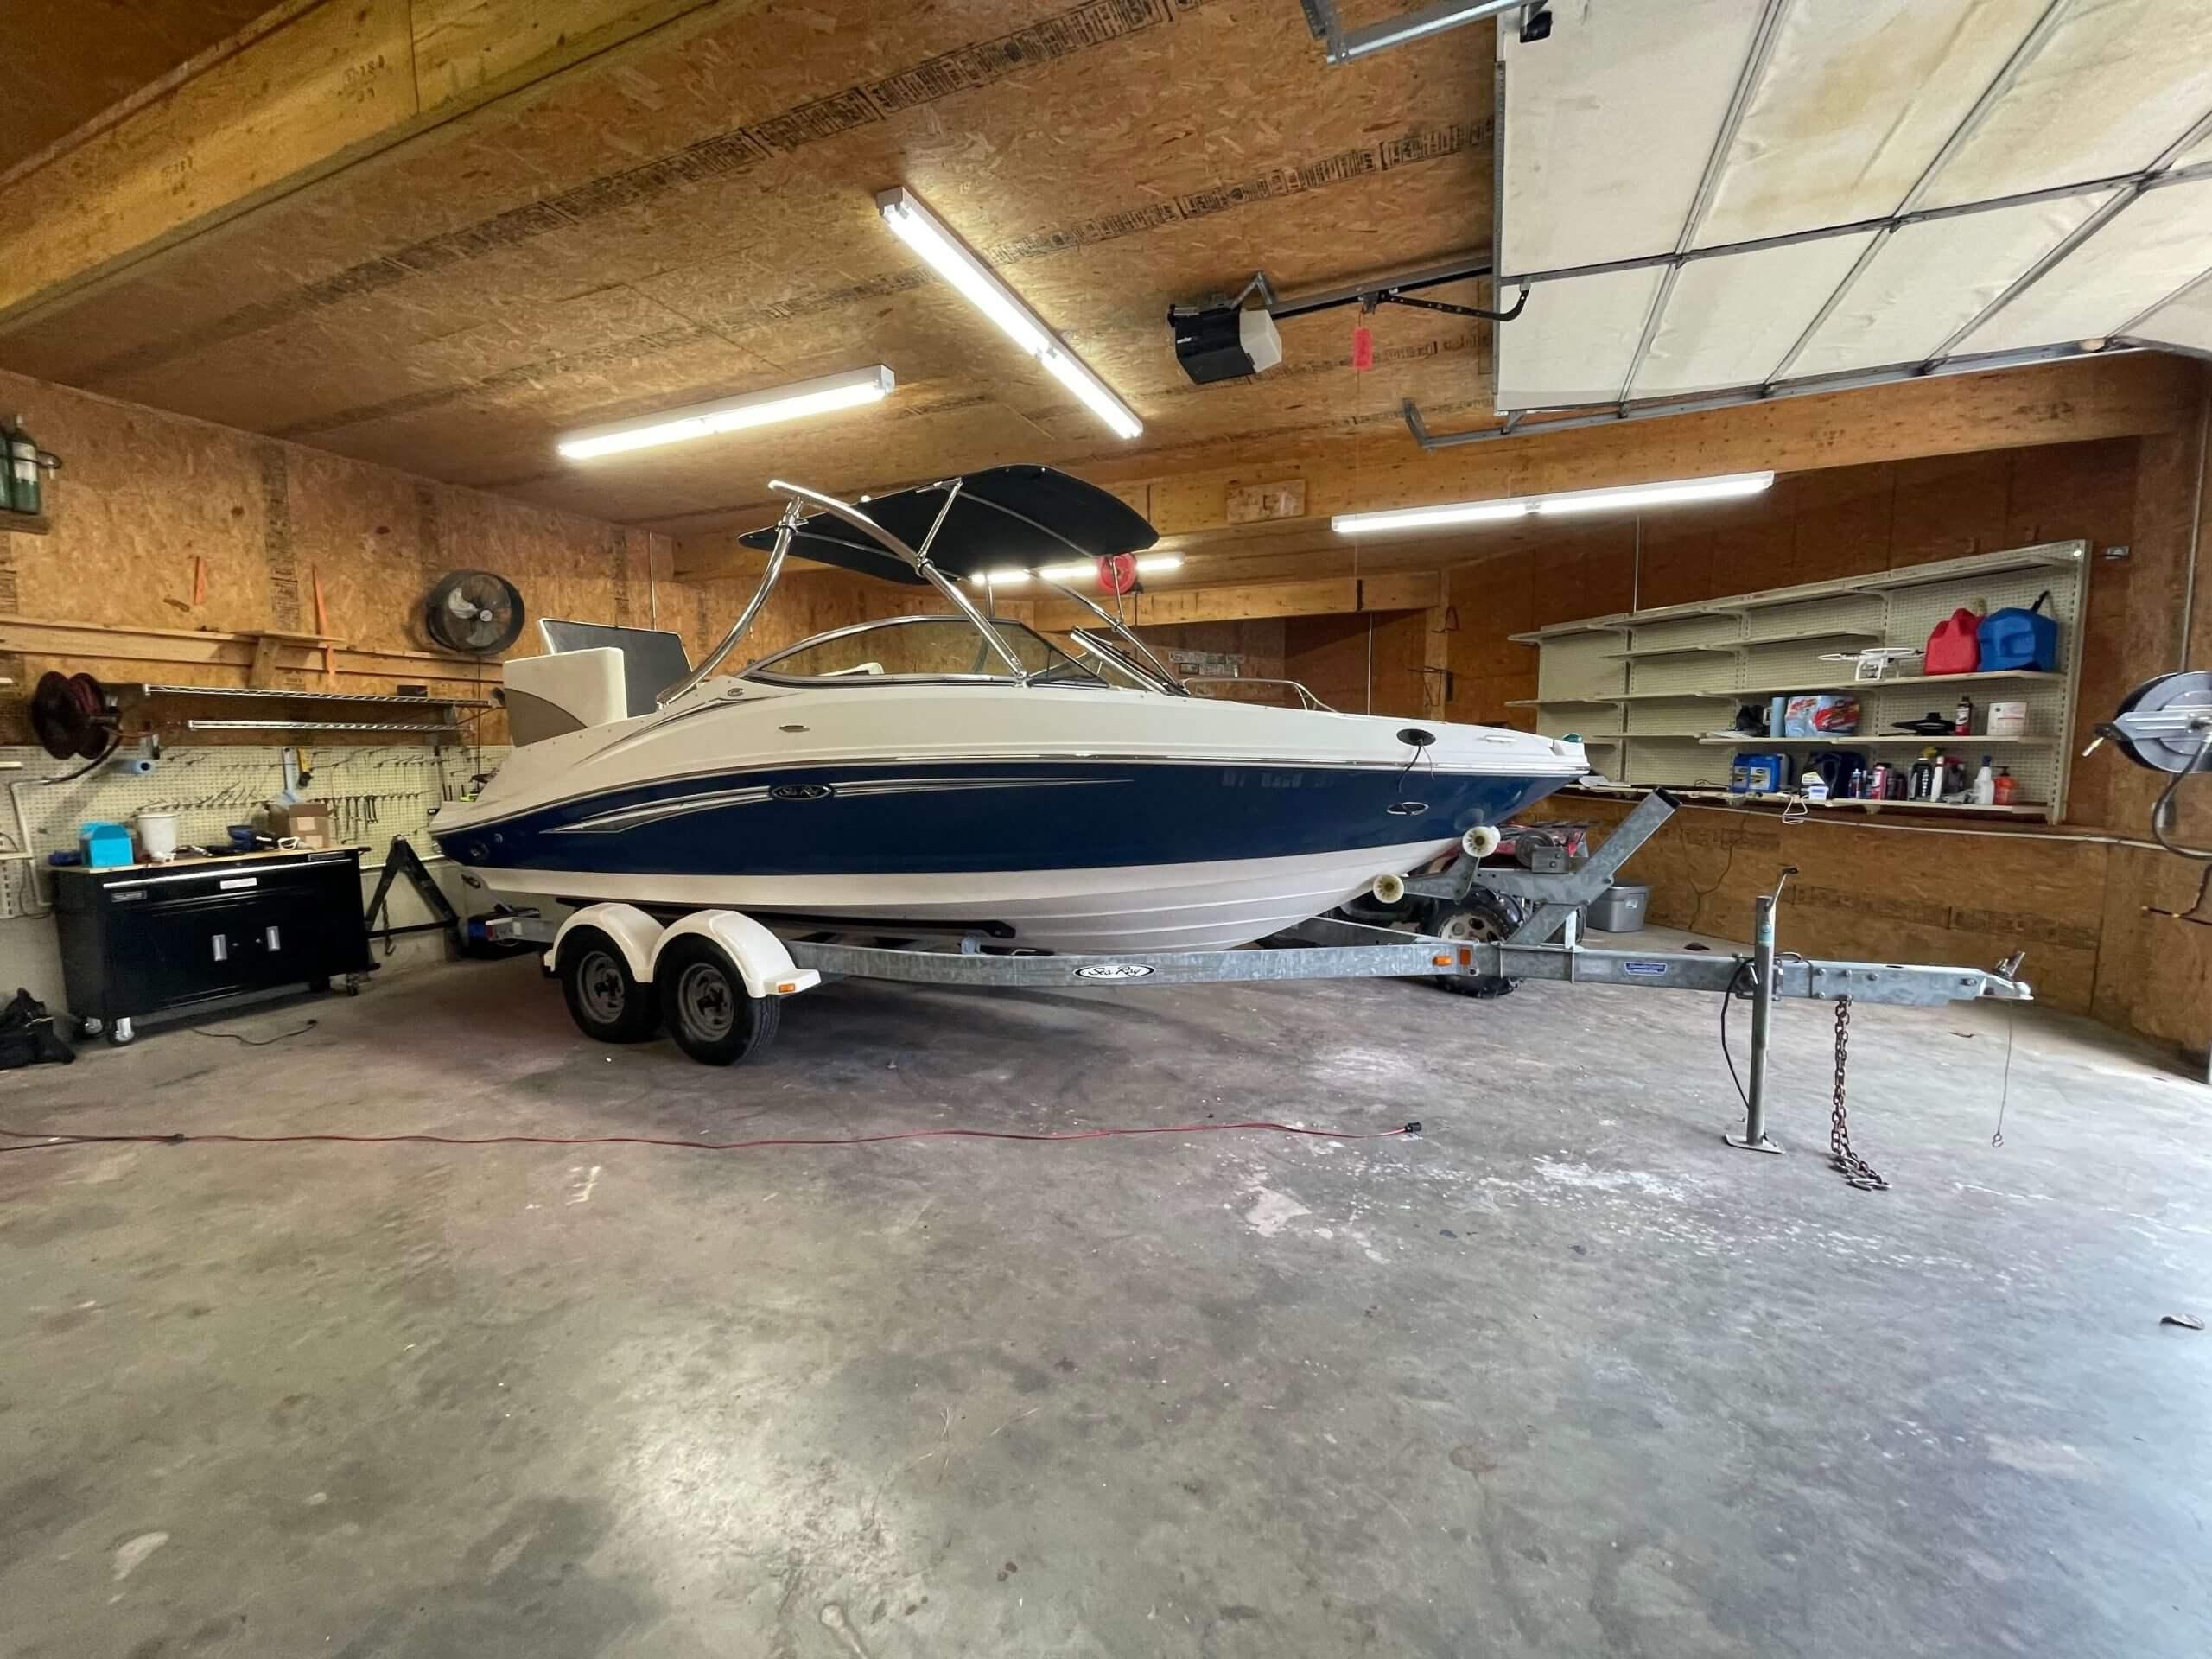 2007 Sea Ray 210 Select (Piparella)